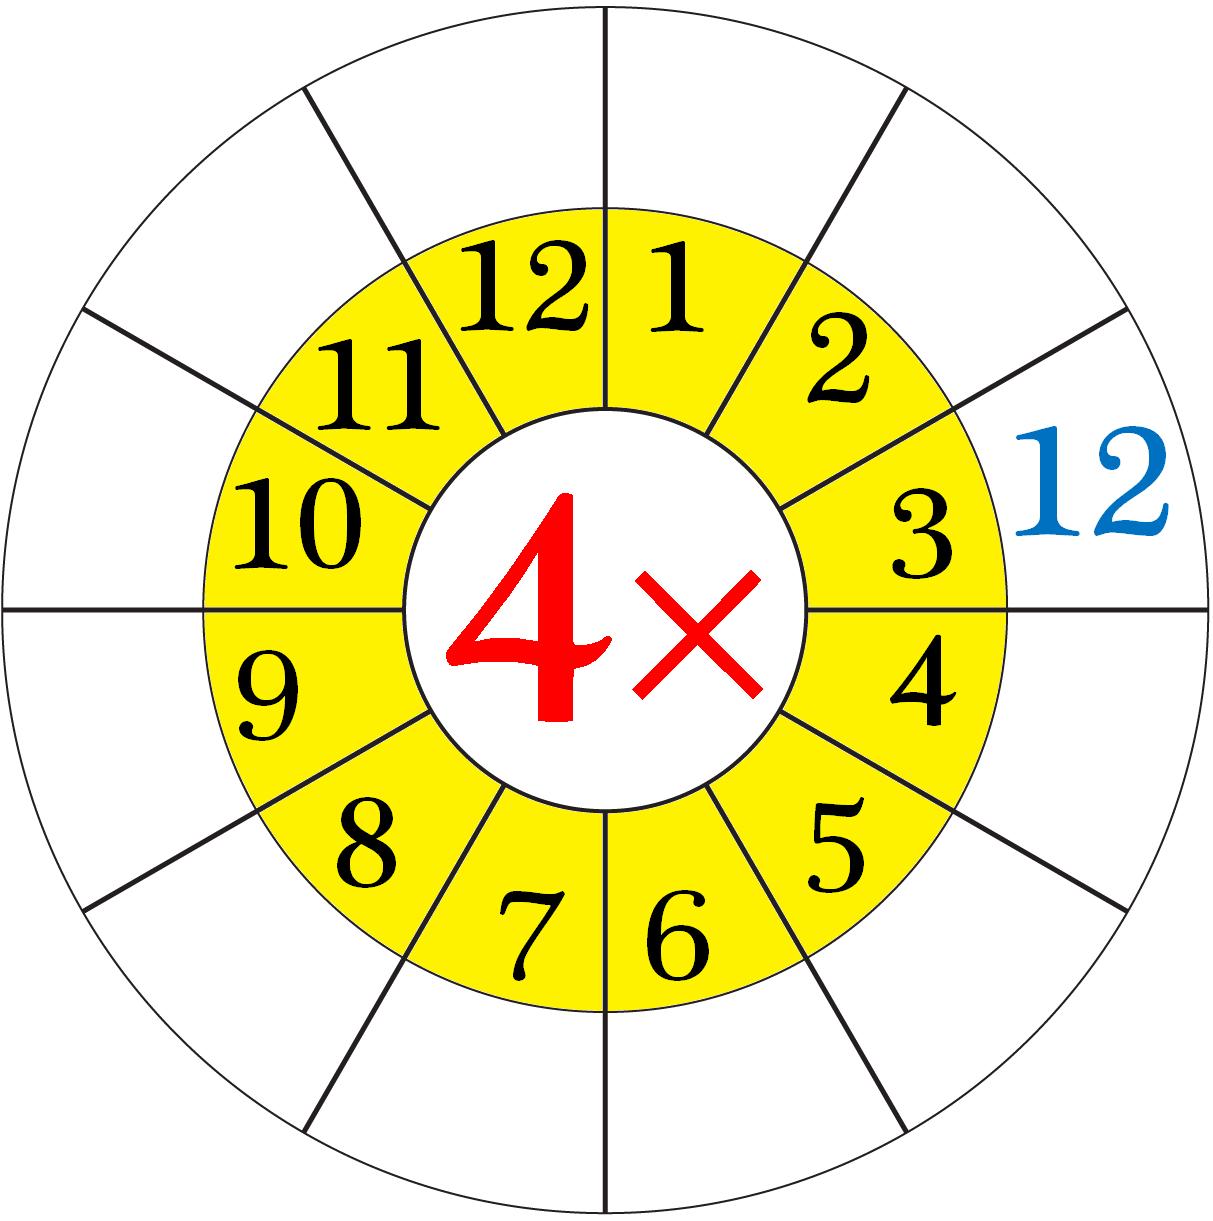 Worksheet On Multiplication Table Of 4